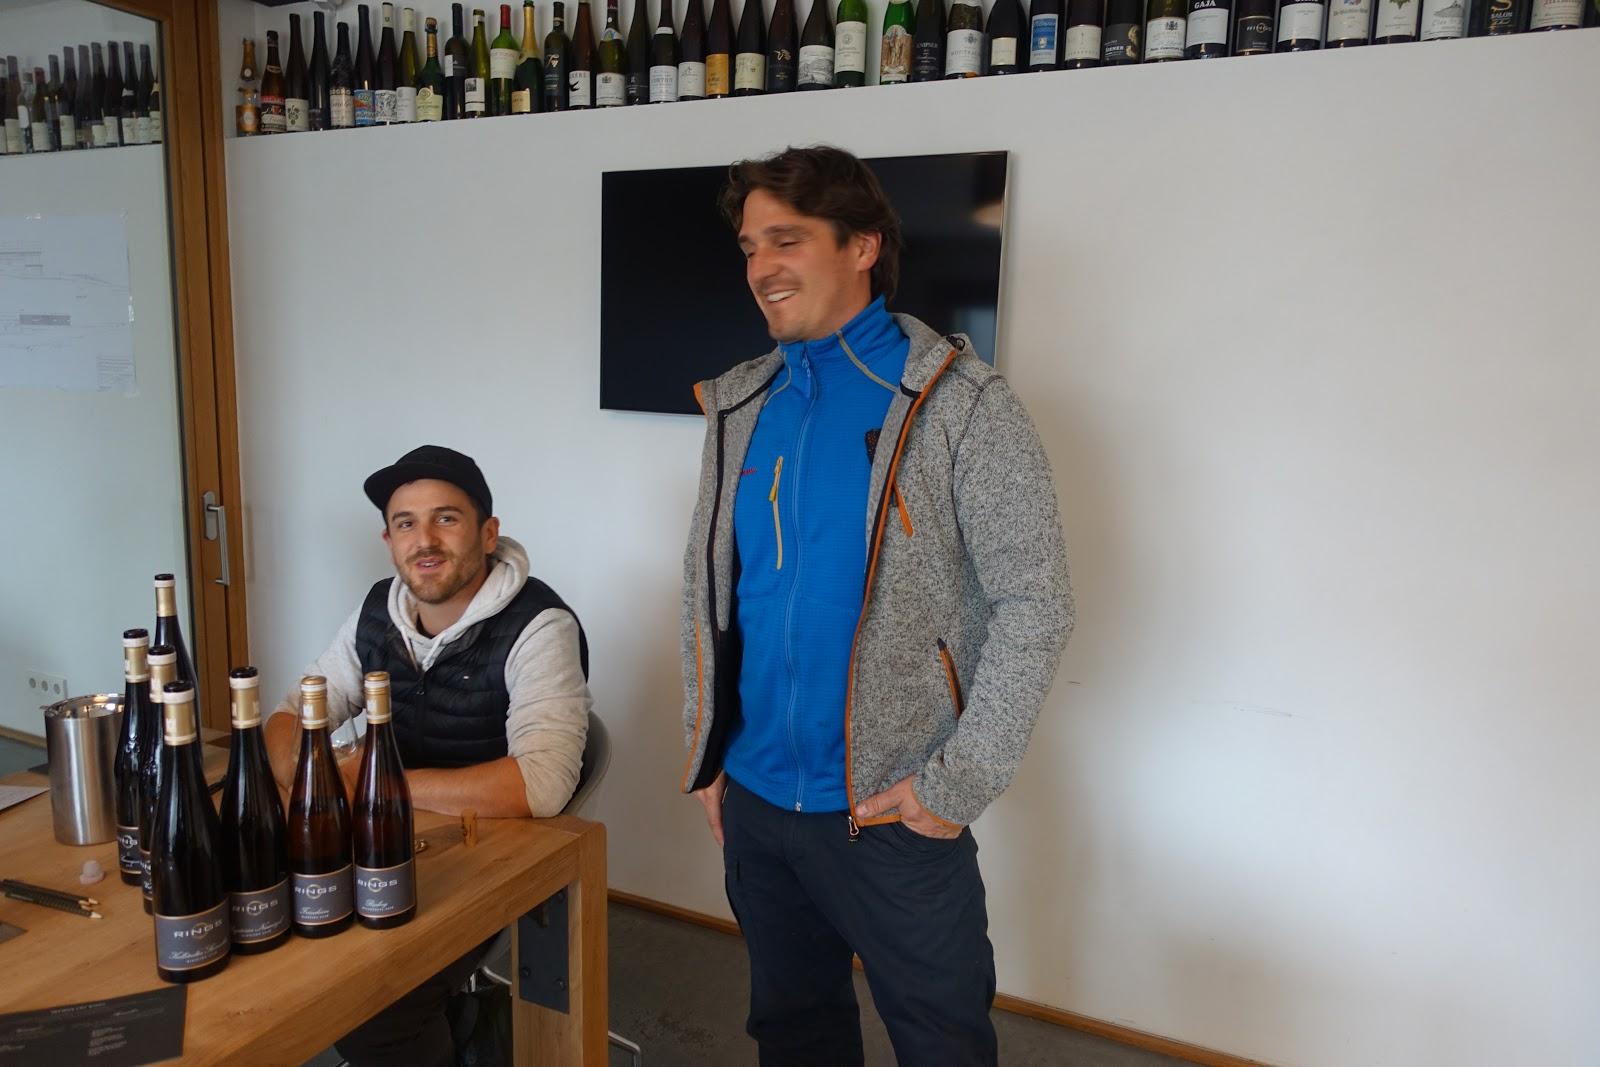 Weingut rings freinsheim